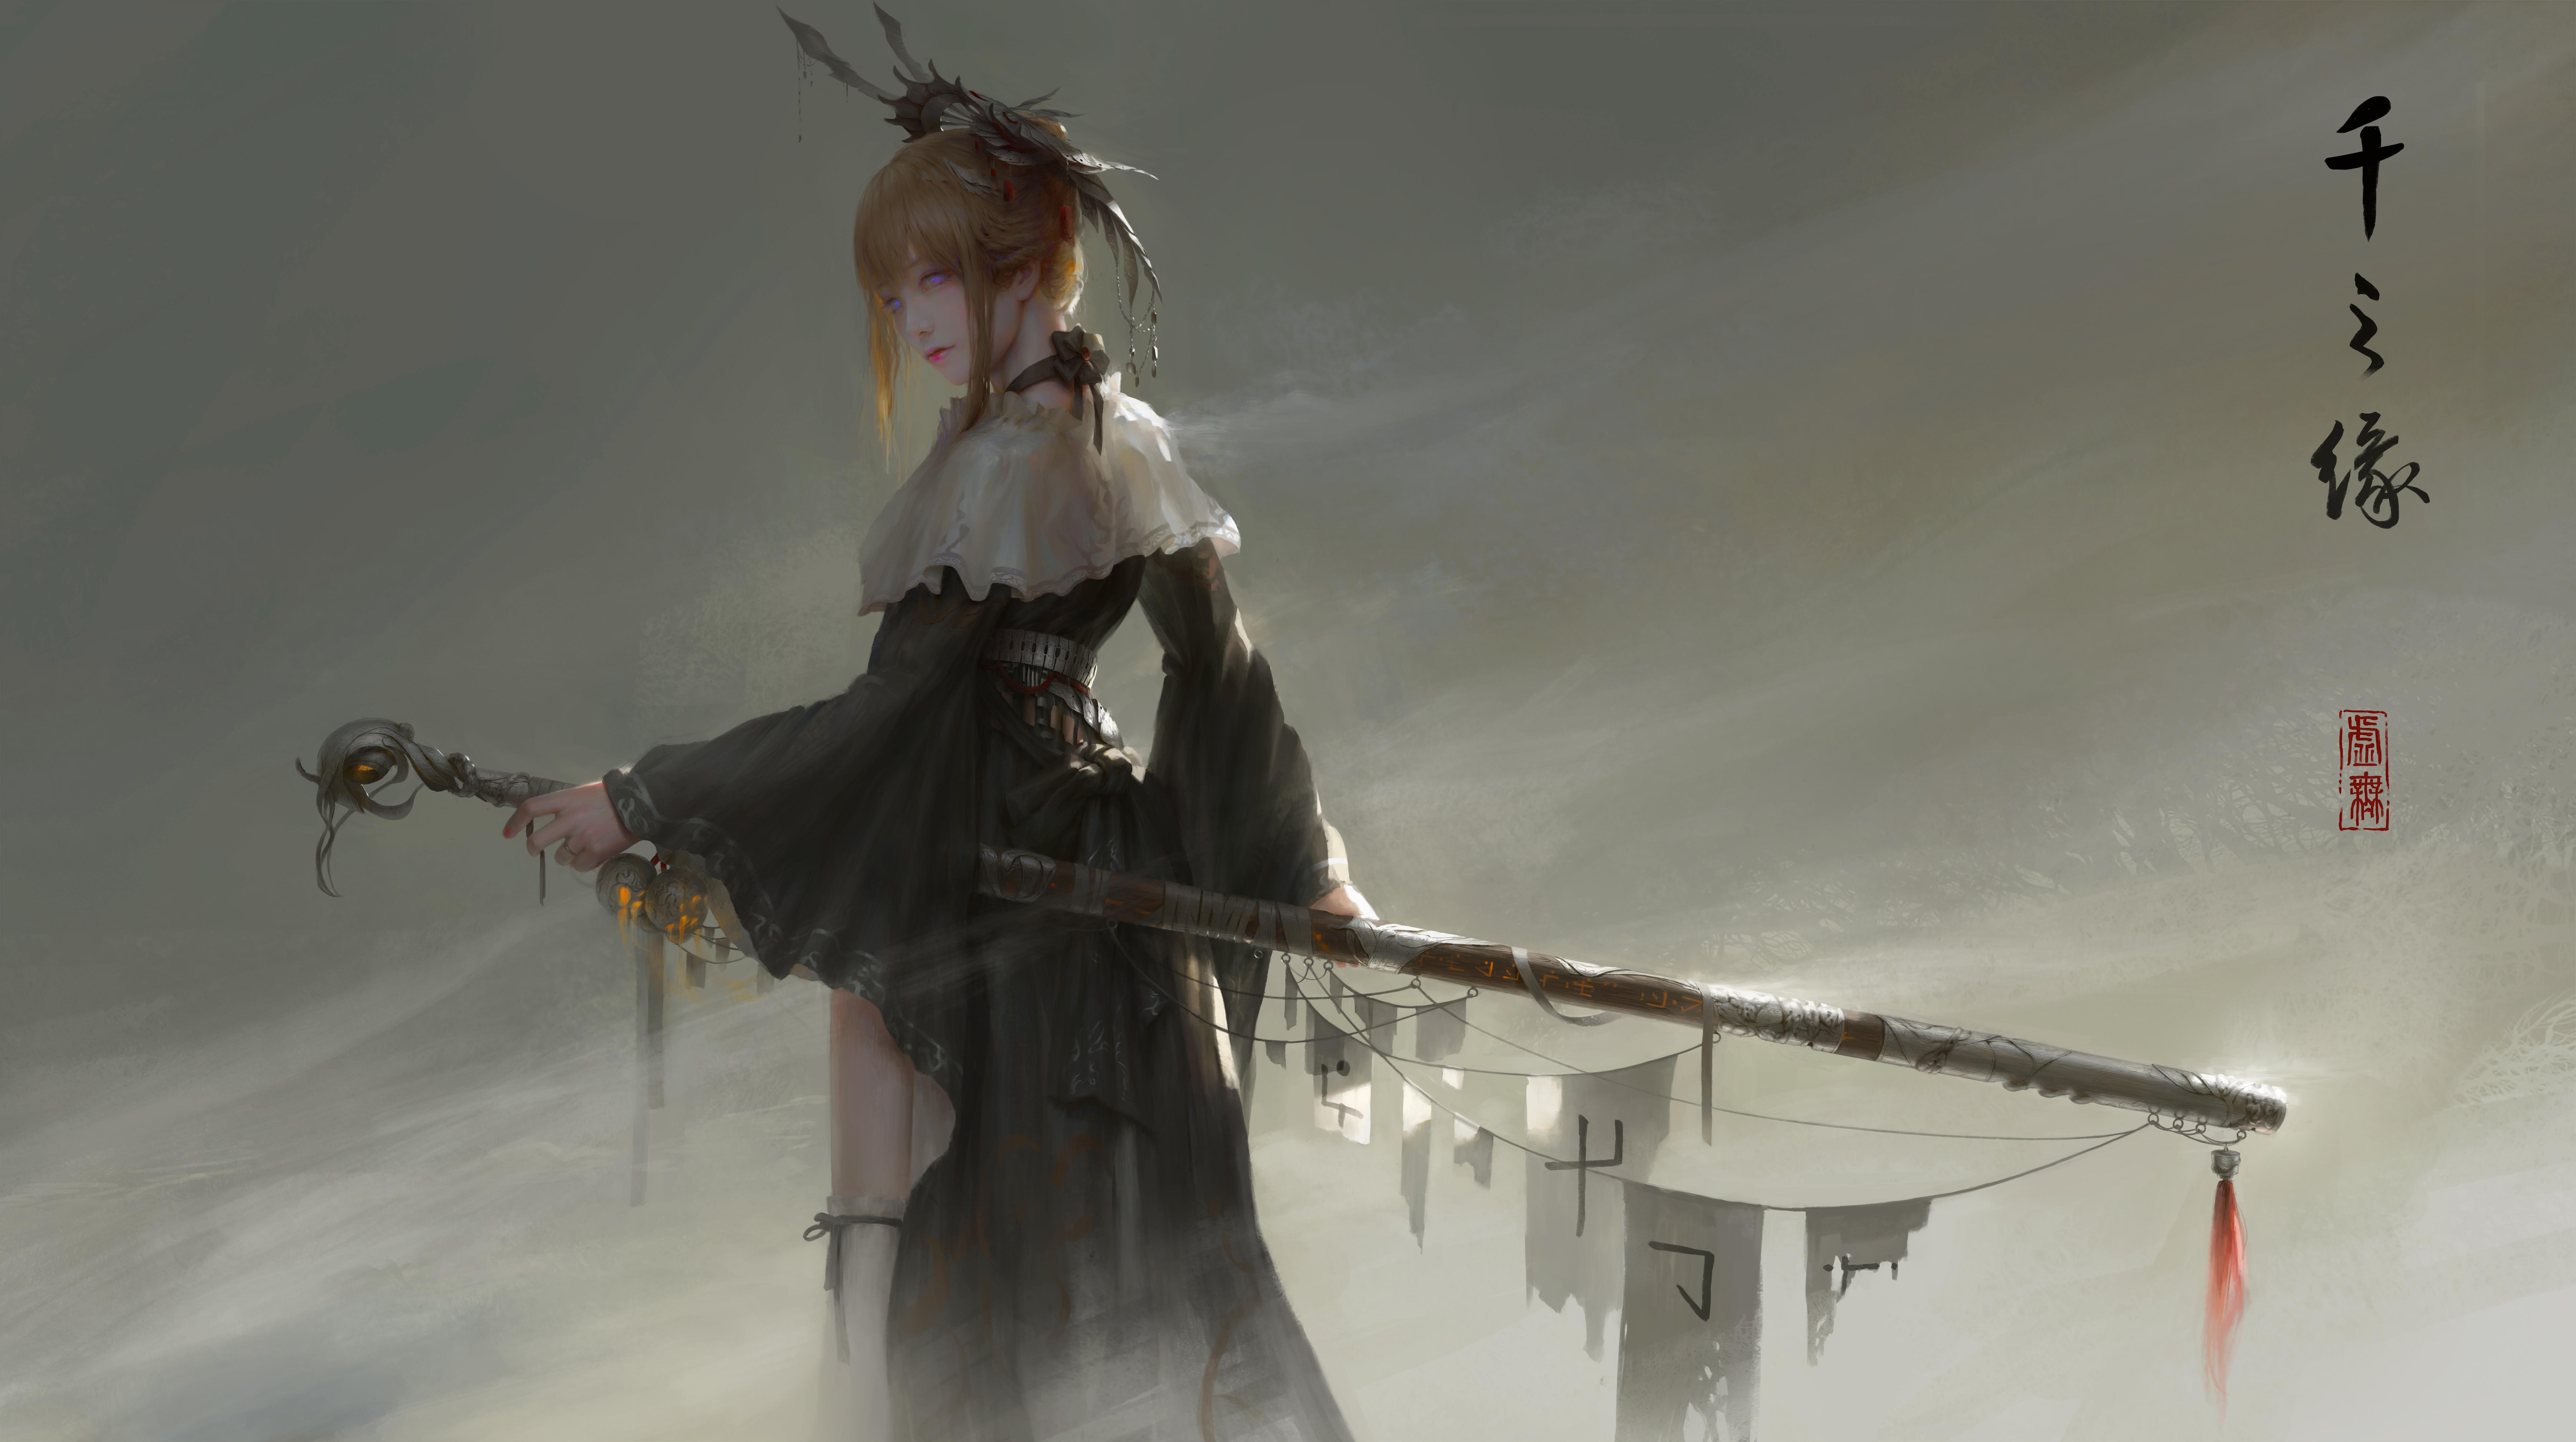 General 8504x4762 fantasy warrior women fantasy art Asian original characters void_0 sword